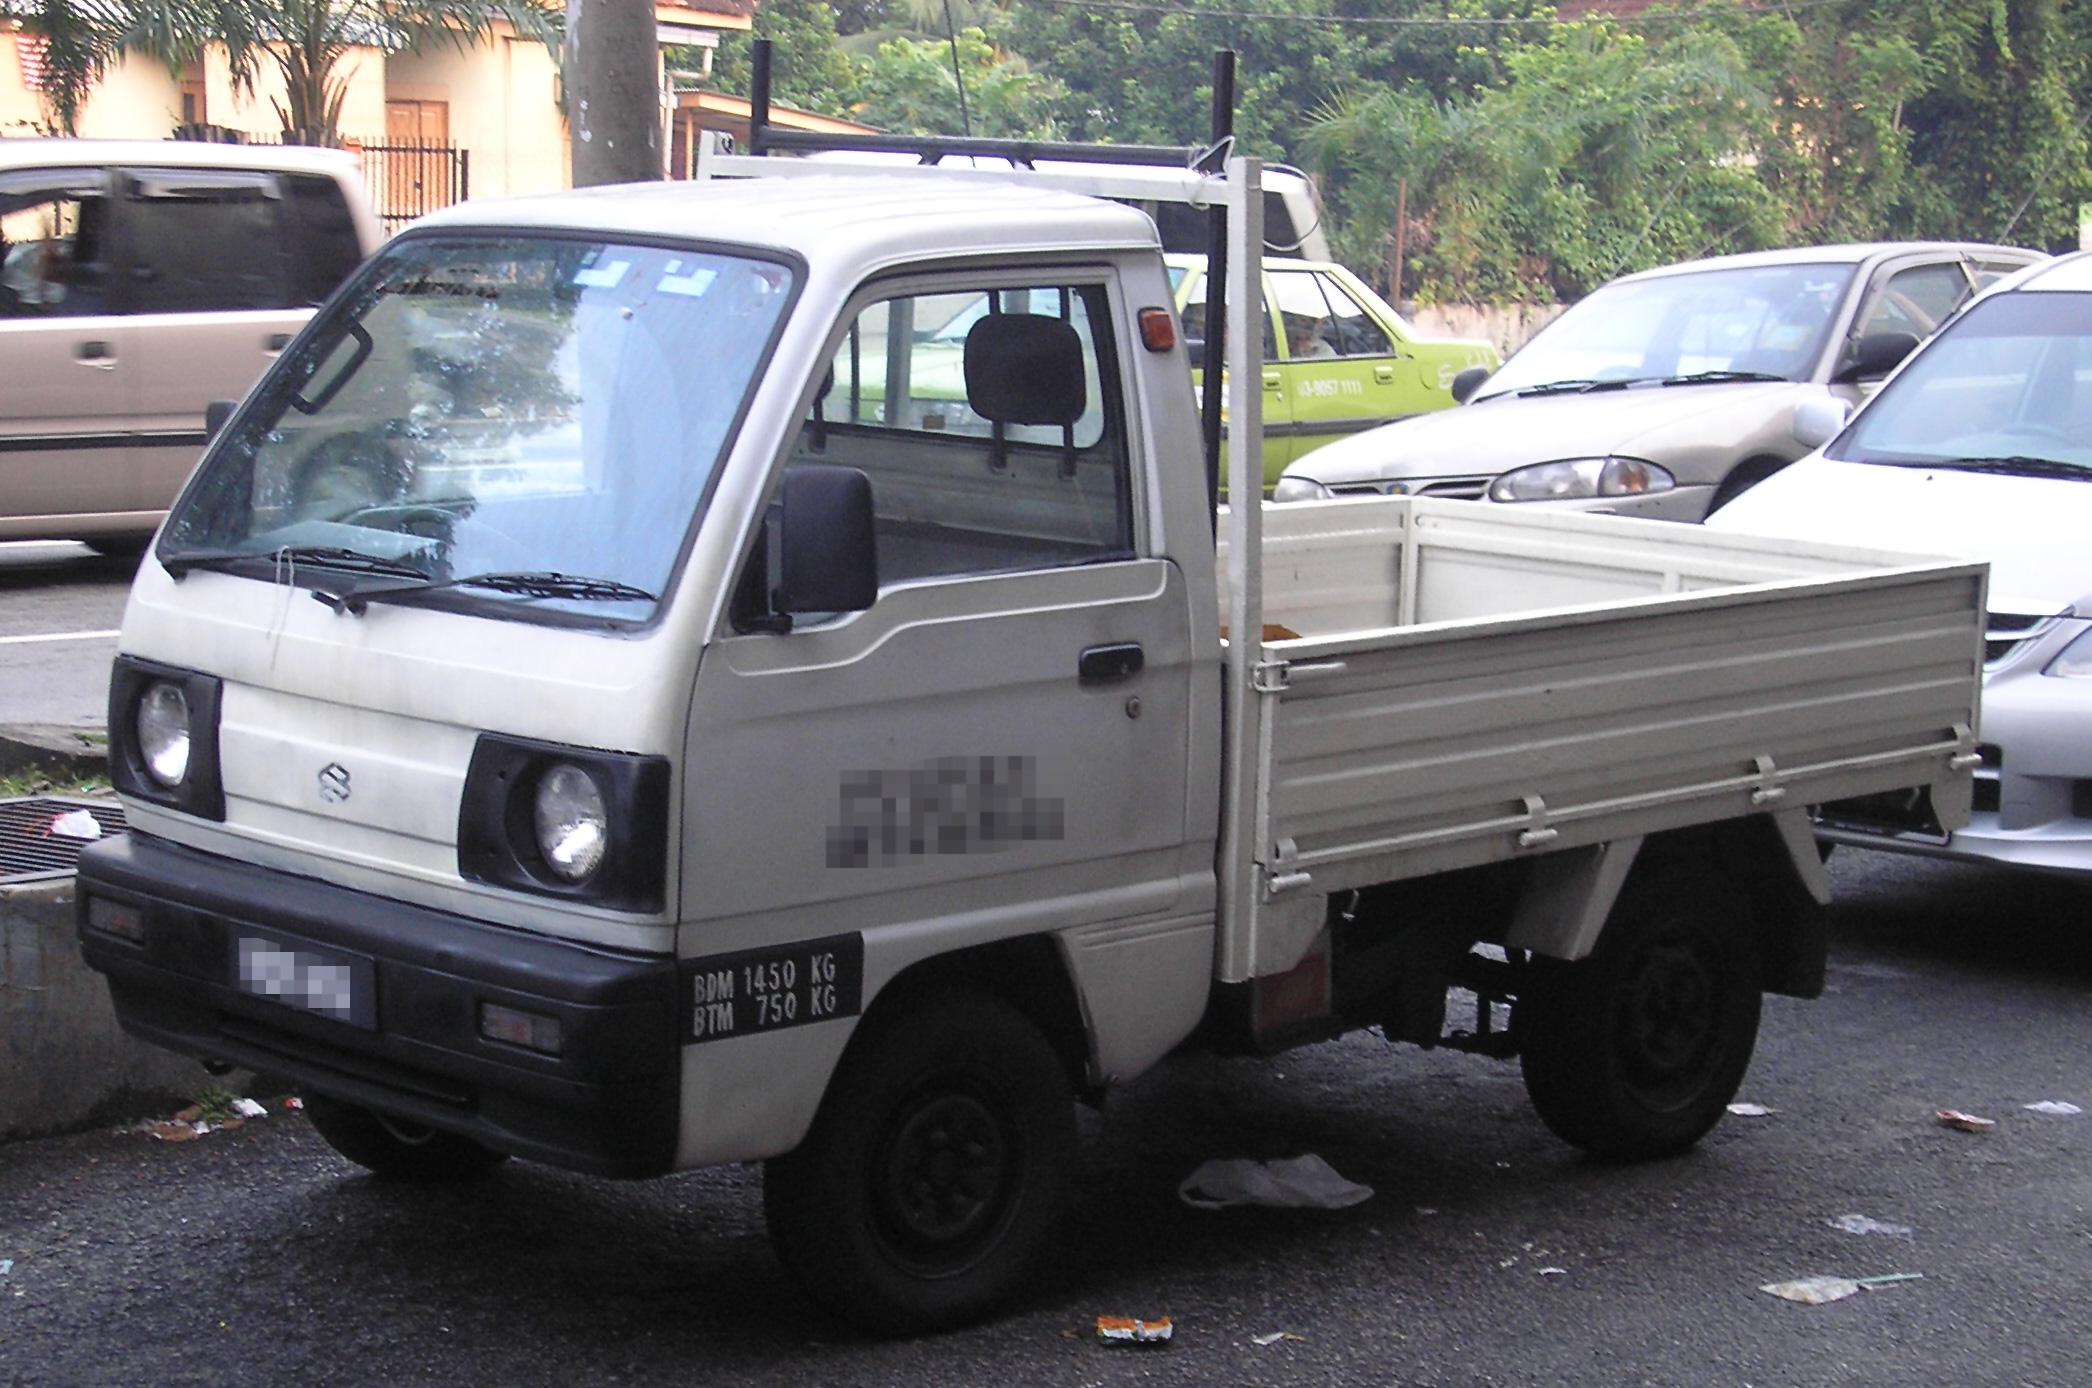 file suzuki carry fifth generation pickup front kuala lumpur. Black Bedroom Furniture Sets. Home Design Ideas